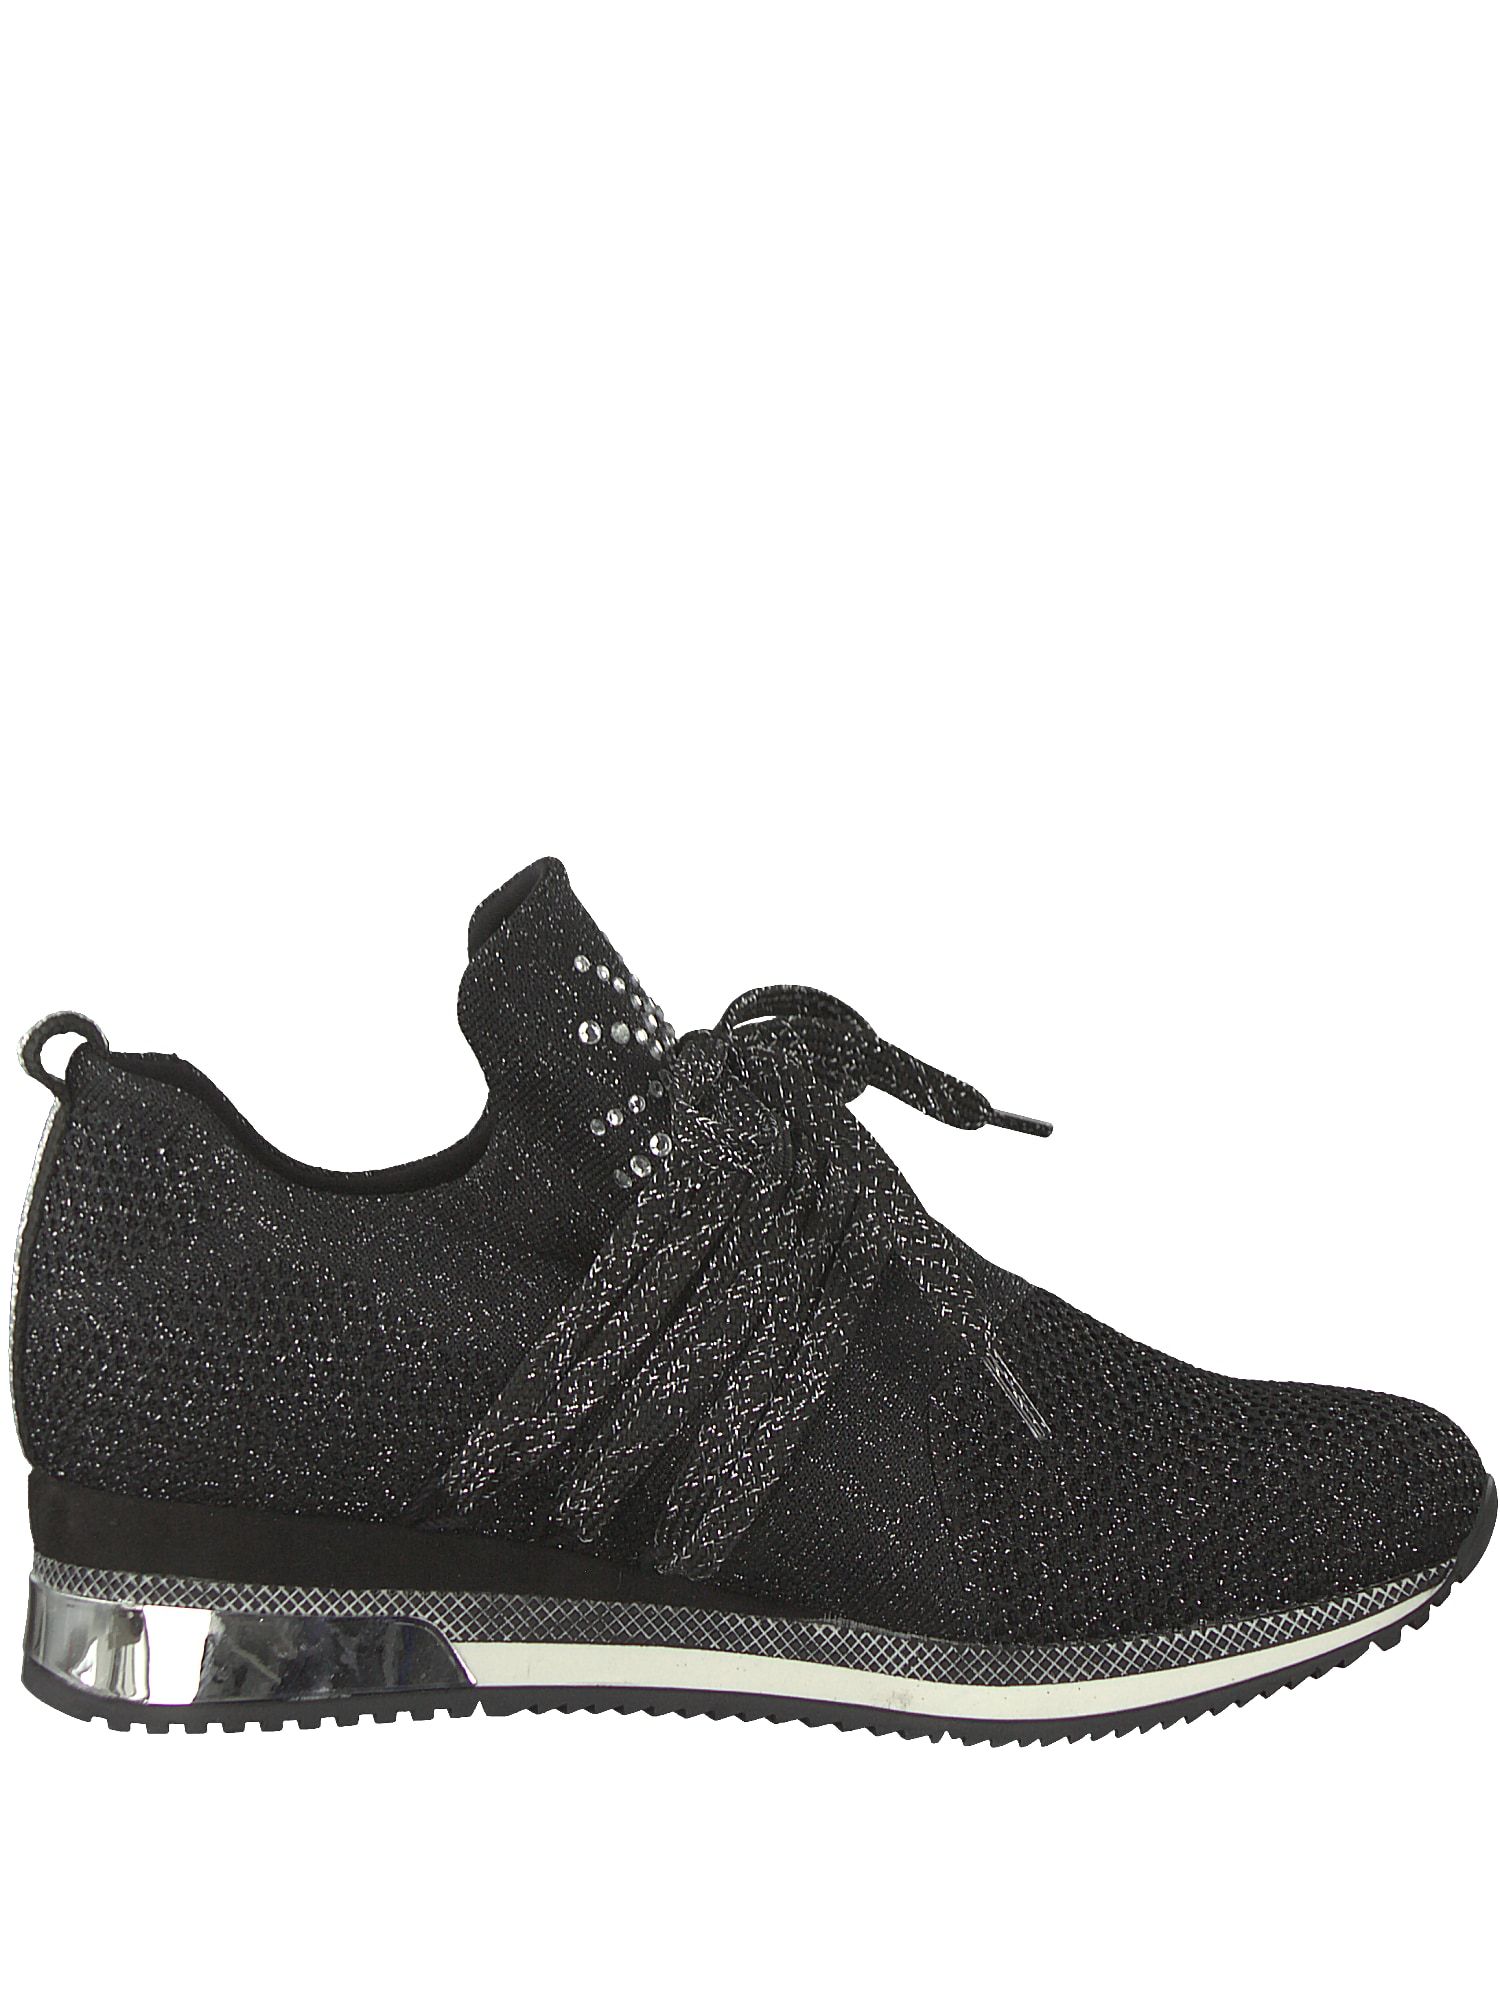 Sneakers laag 'Sneaker mit Glitzer'